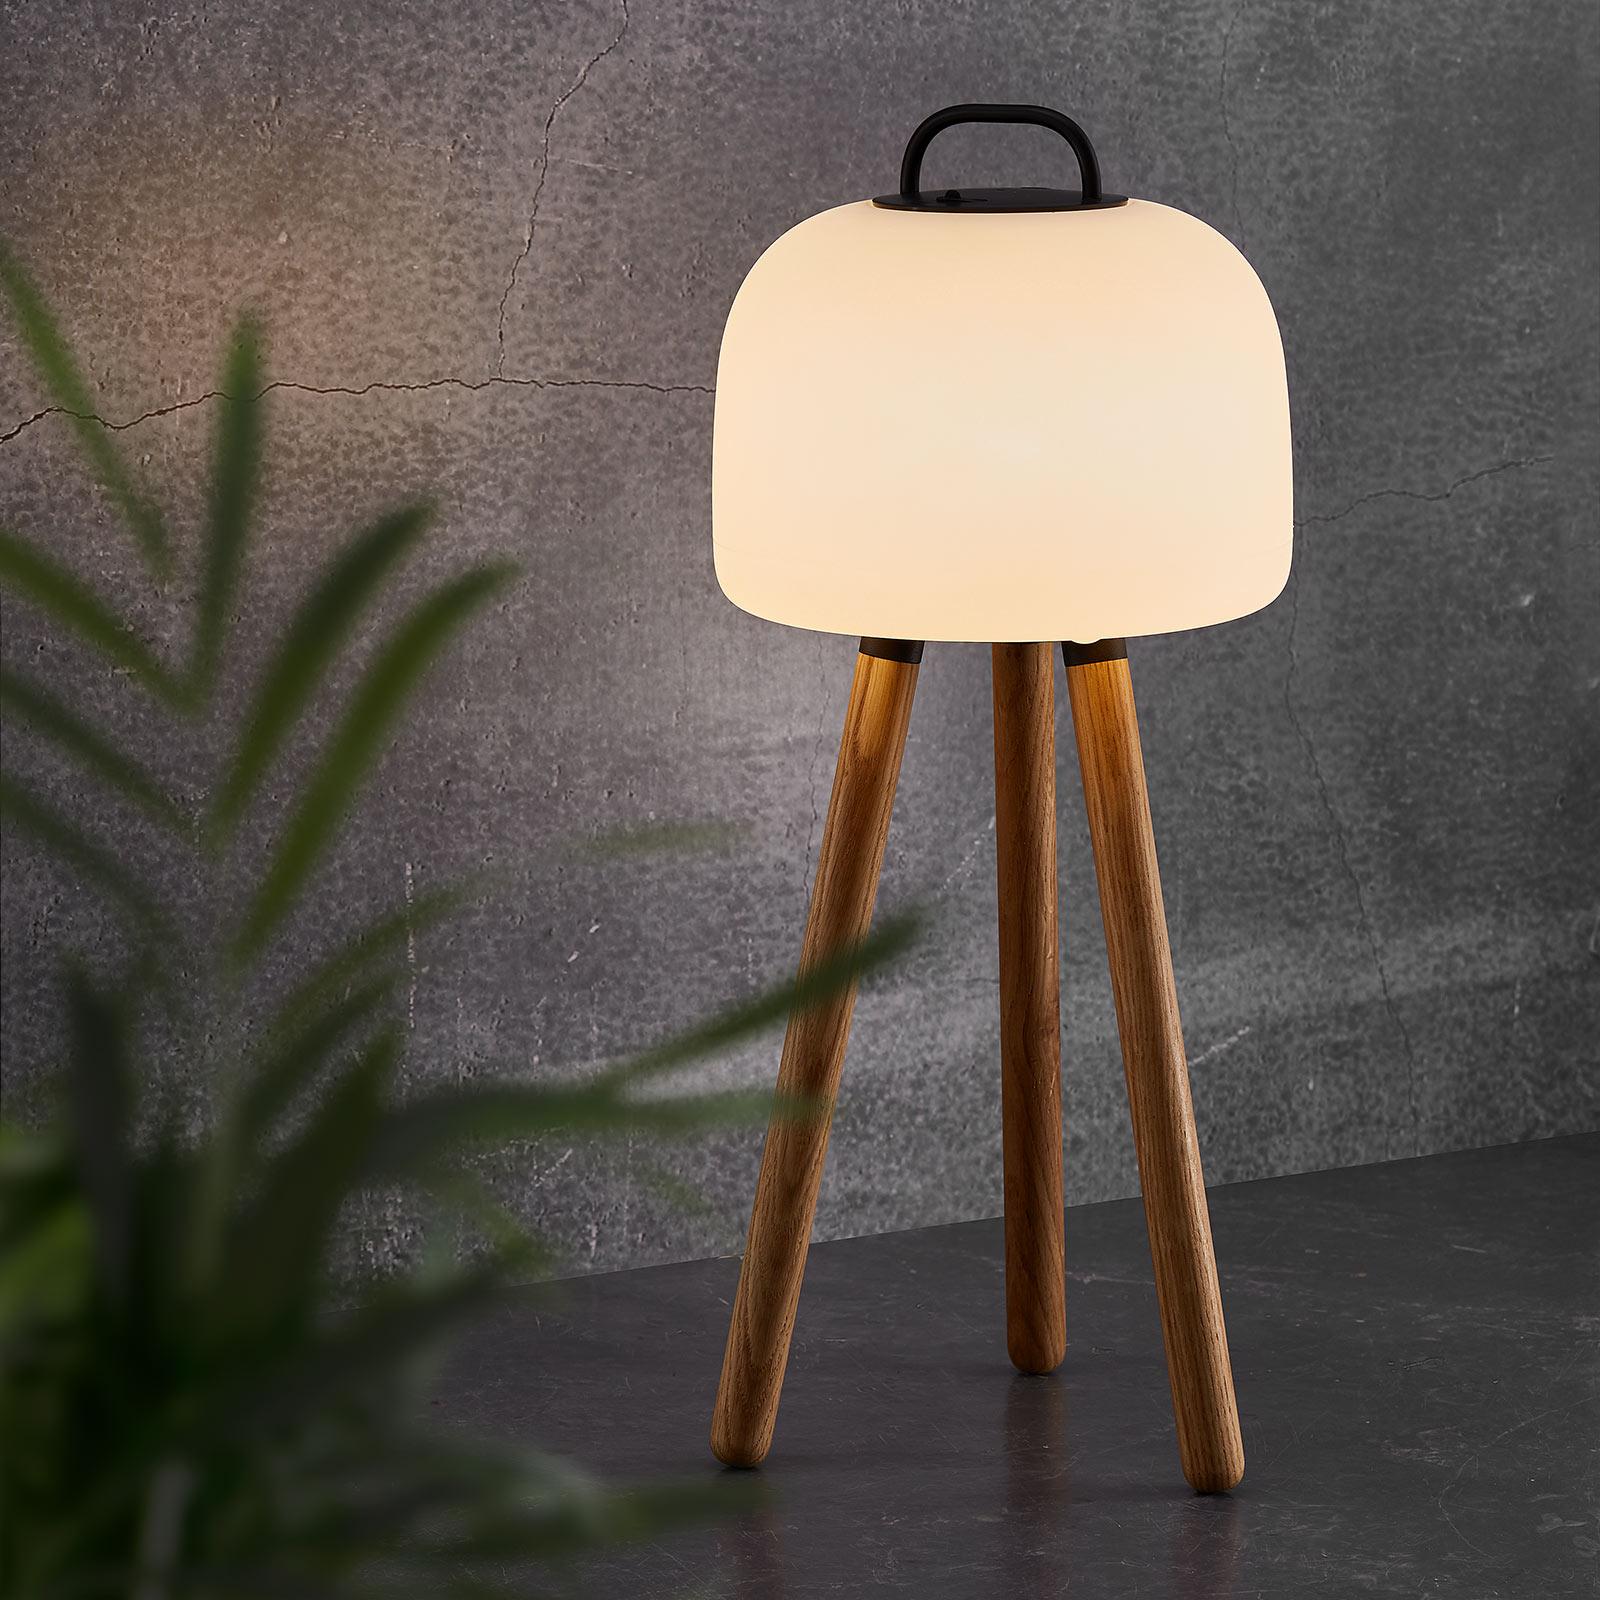 Lampa stołowa LED Kettle trójnóg drewno klosz 22cm